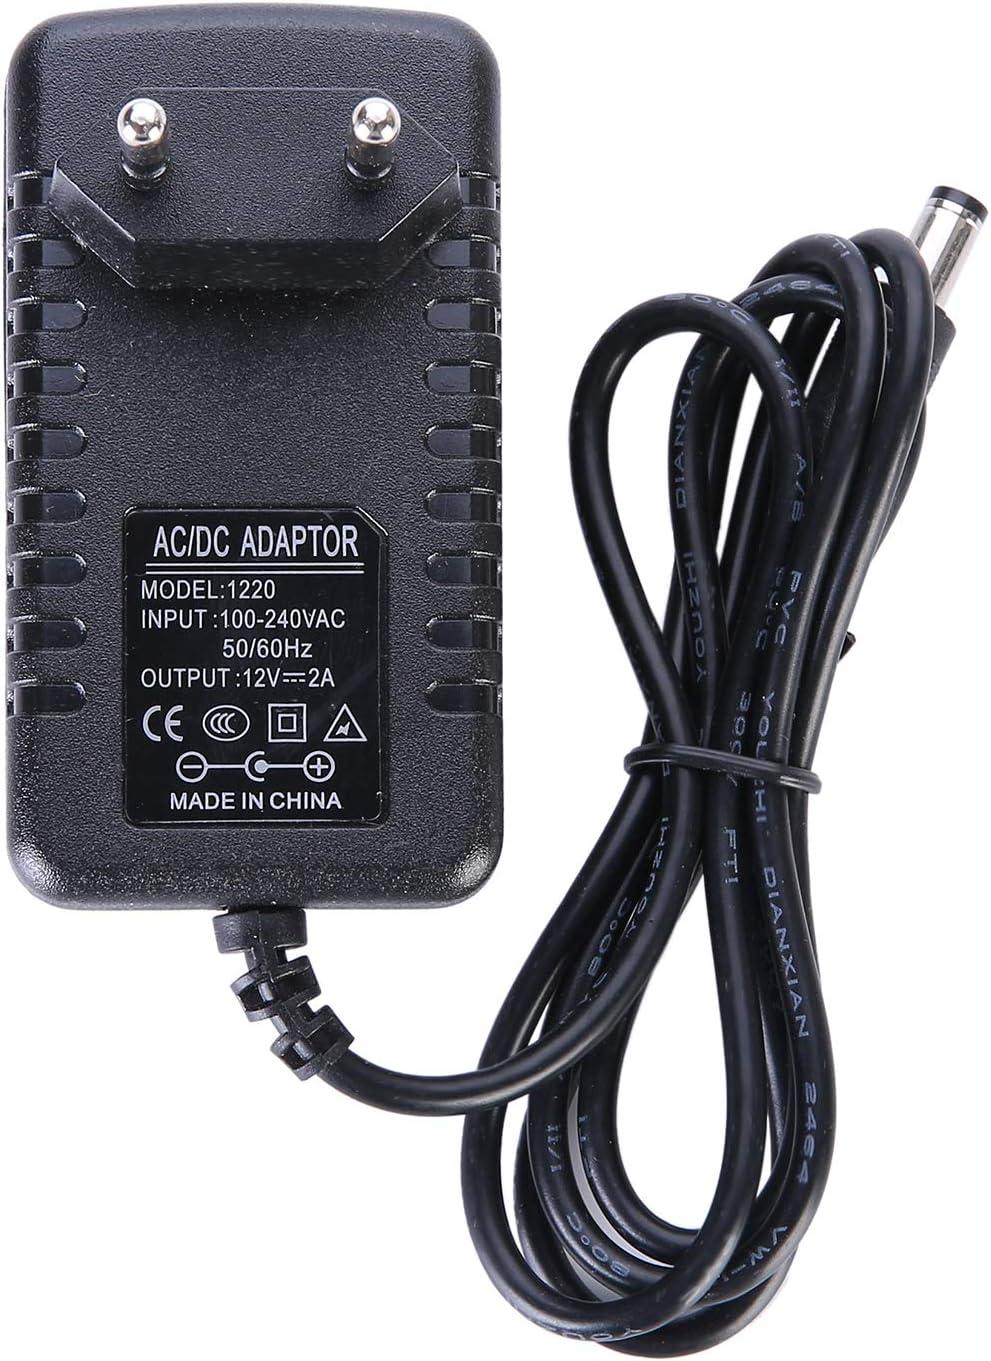 Sodial Odial R Eu Stecker Elektrische Luftpumpe Dc12v Ac230v Aufpumpen Deflate Pumpen Auto Inflator Elektropumpe Mit 3 Duesen Auto